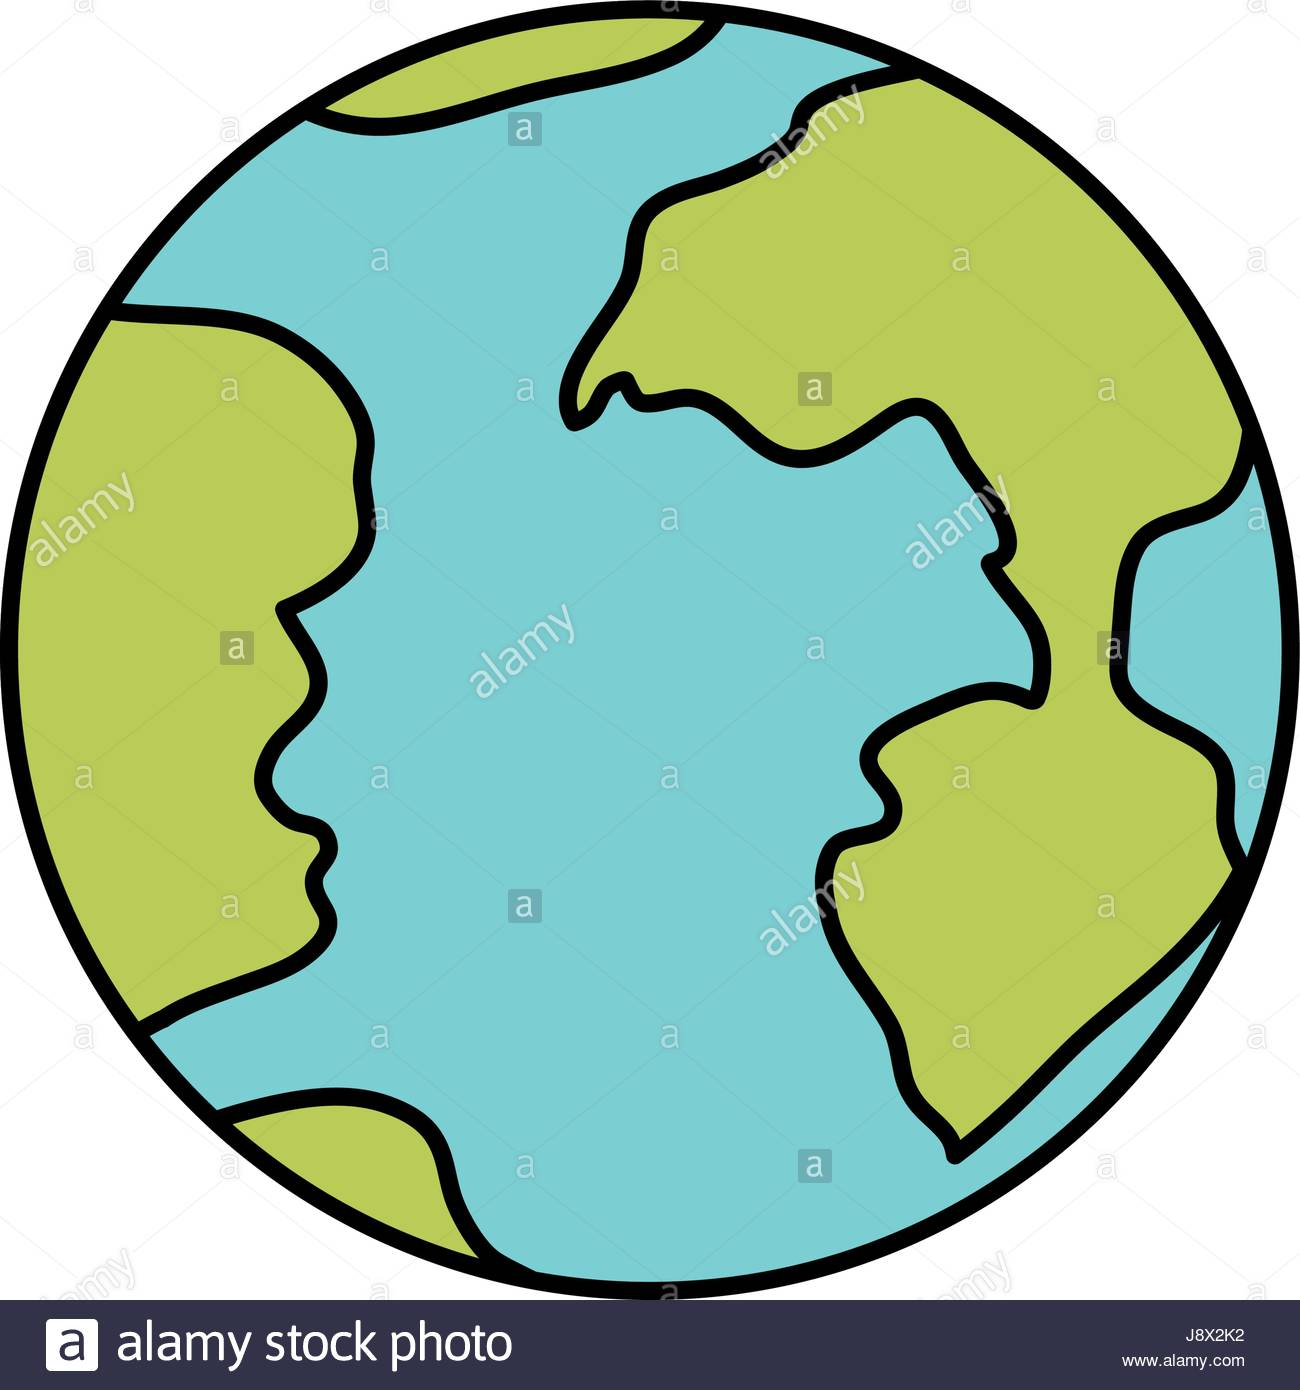 1300x1390 Colorful Silhouette Of Earth Globe Icon Stock Vector Art